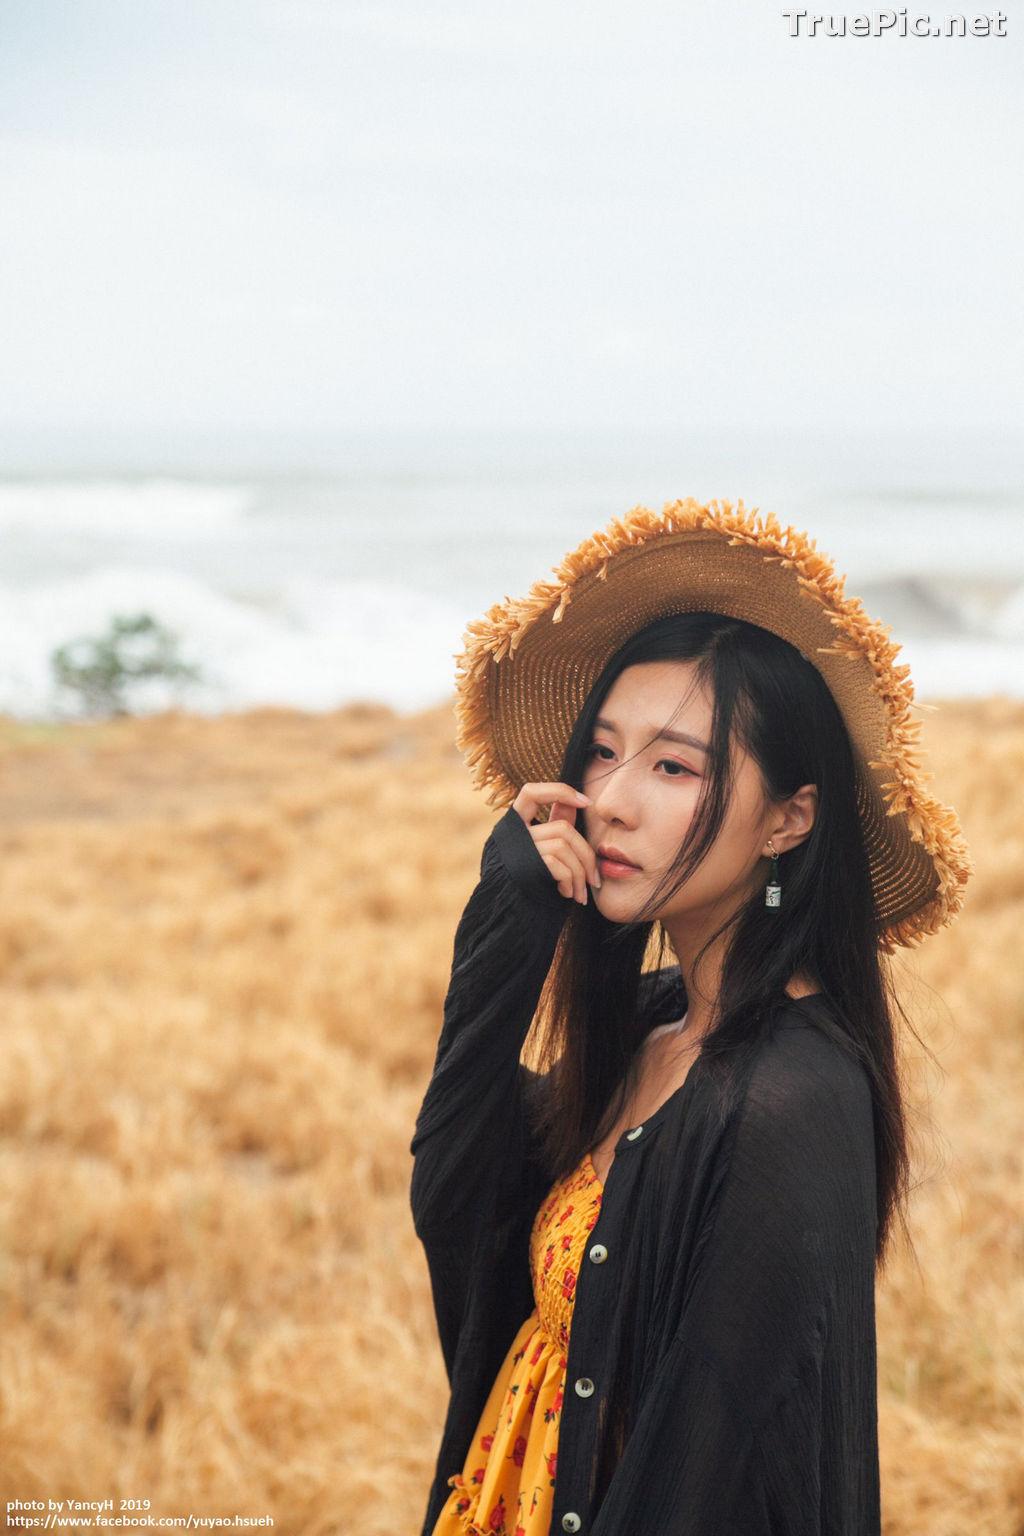 Image Taiwanese Model - 郁晴 - Welcome Summer with Beautiful Bikini Girls - TruePic.net - Picture-10